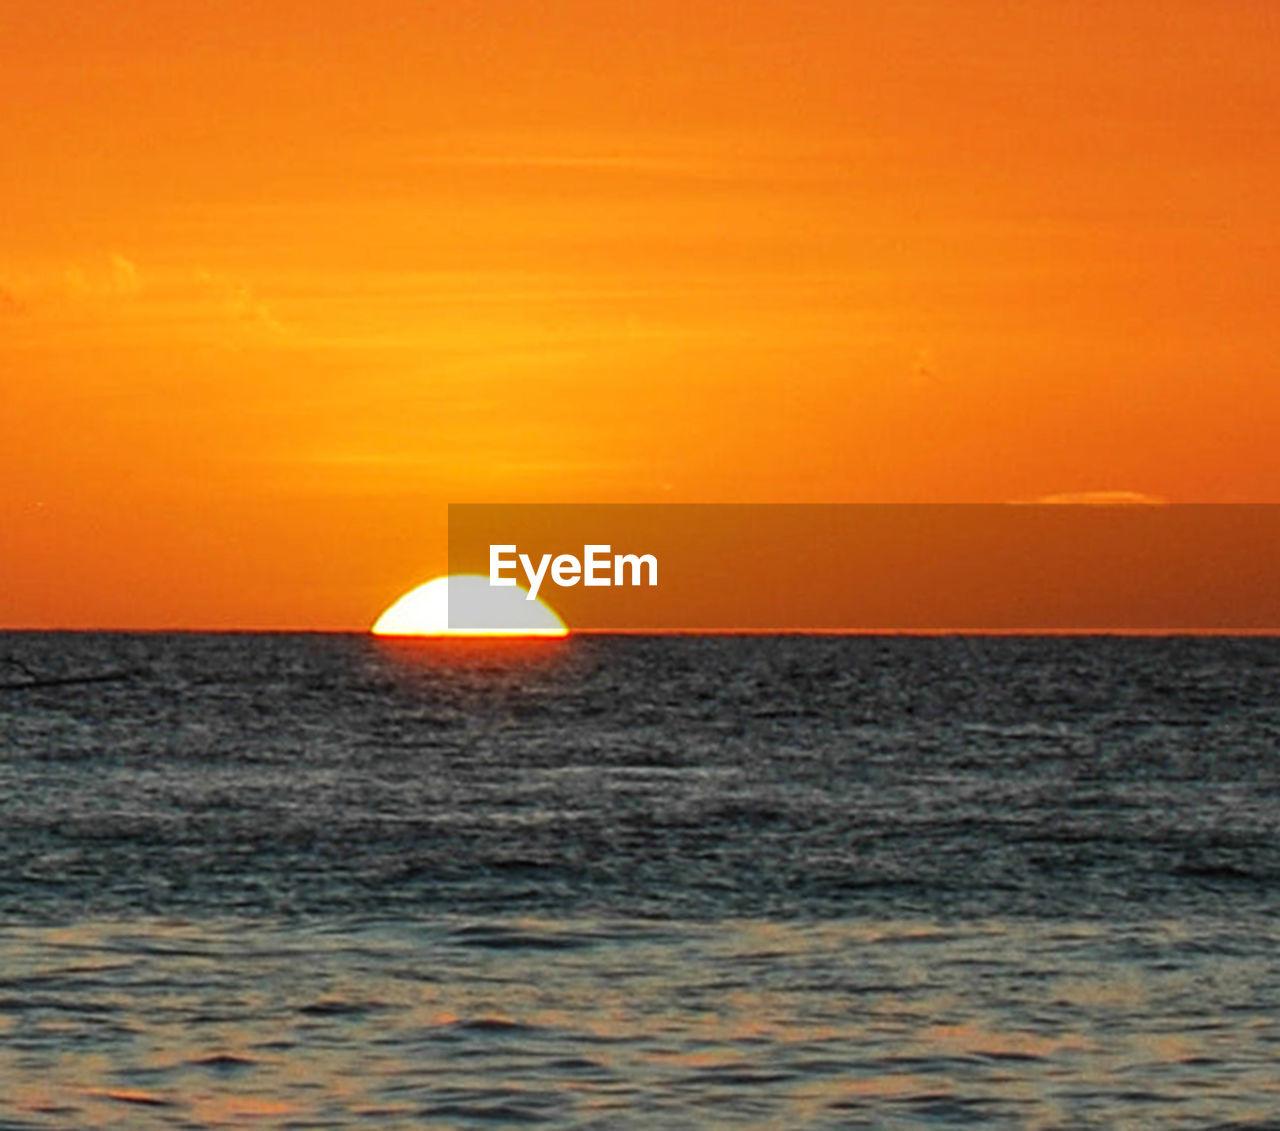 sea, sunset, water, sky, sun, orange color, horizon, horizon over water, scenics - nature, beauty in nature, nature, tranquility, no people, outdoors, tranquil scene, dramatic sky, motion, idyllic, urban skyline, romantic sky